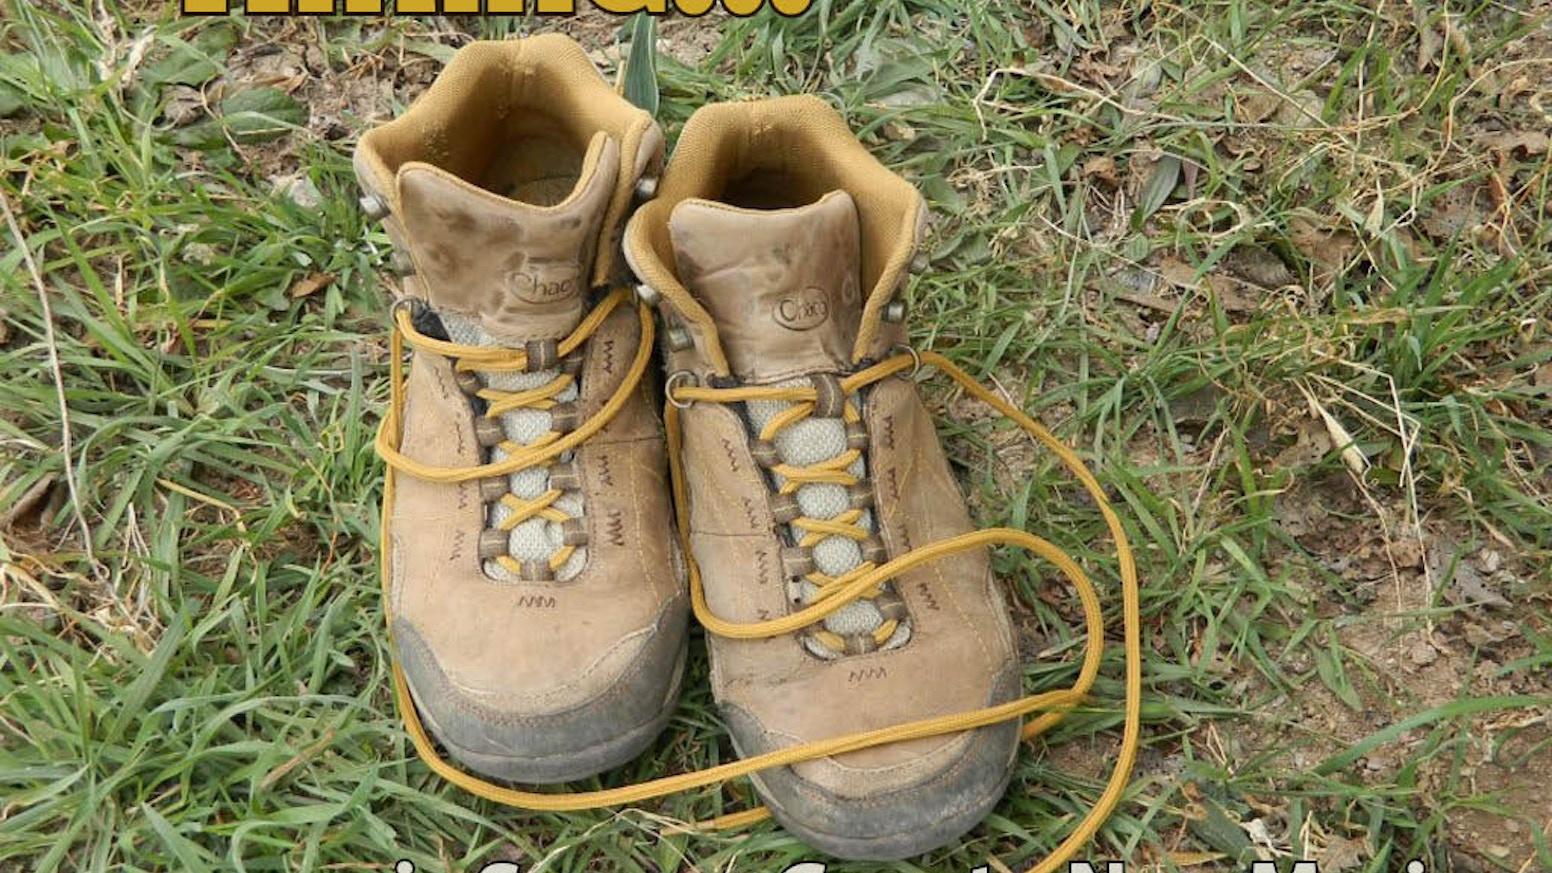 New mexico socorro county magdalena - Hiking In Socorro County New Mexico The Guide